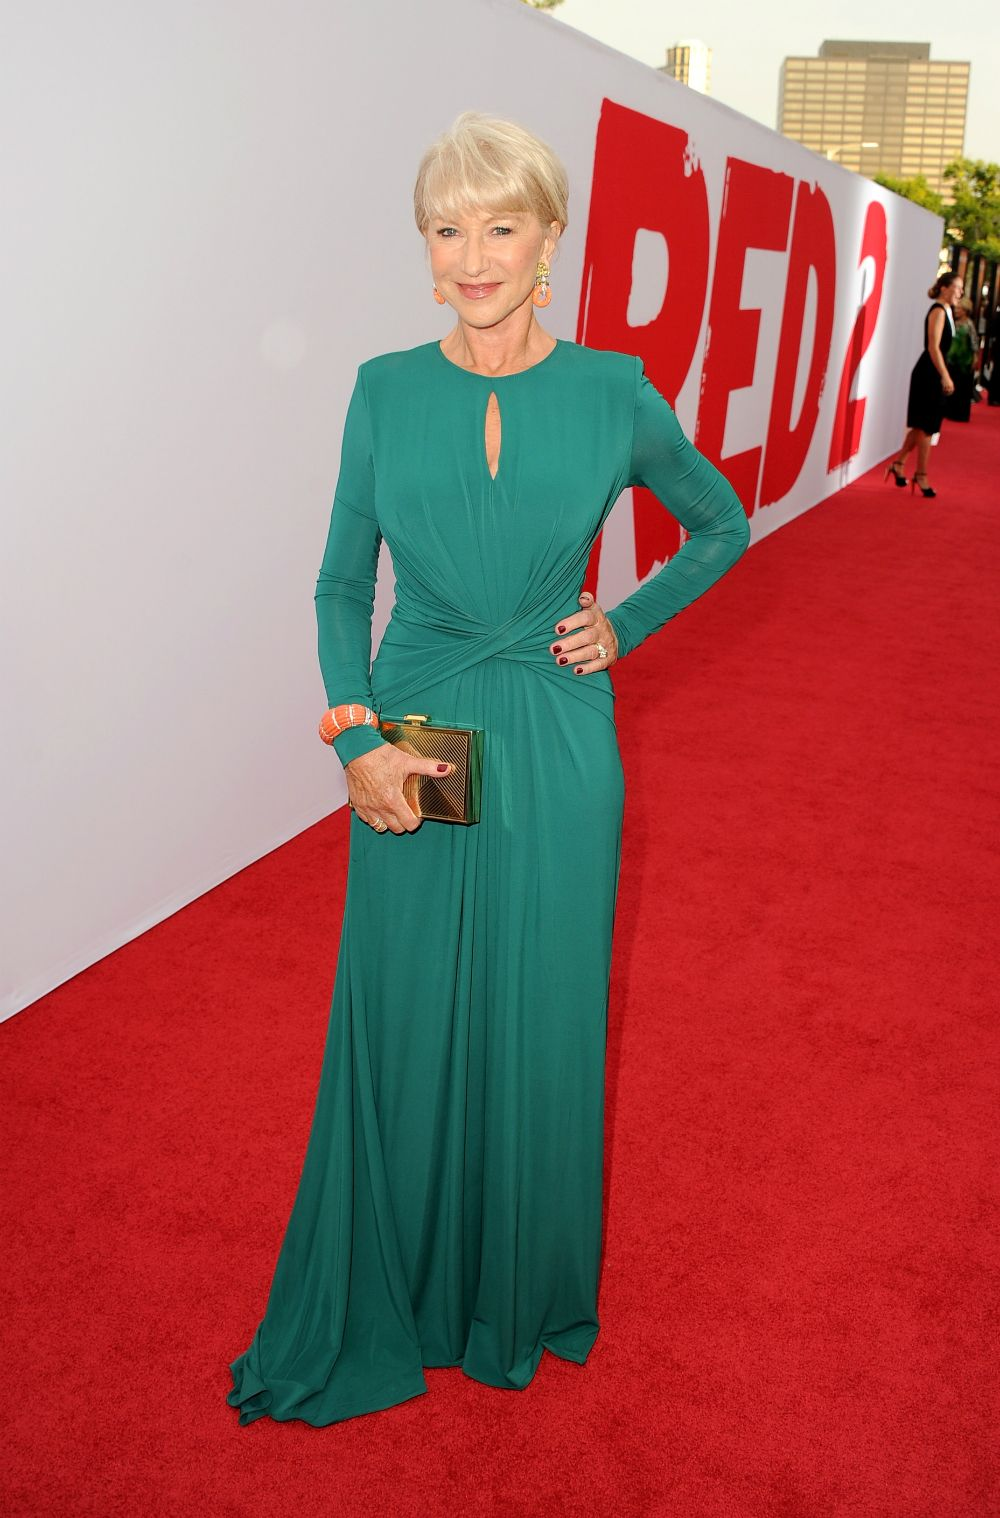 Red 2 Premiere PHOTOS   Helen Mirren Hot   Mary Louise Parker   Styleite